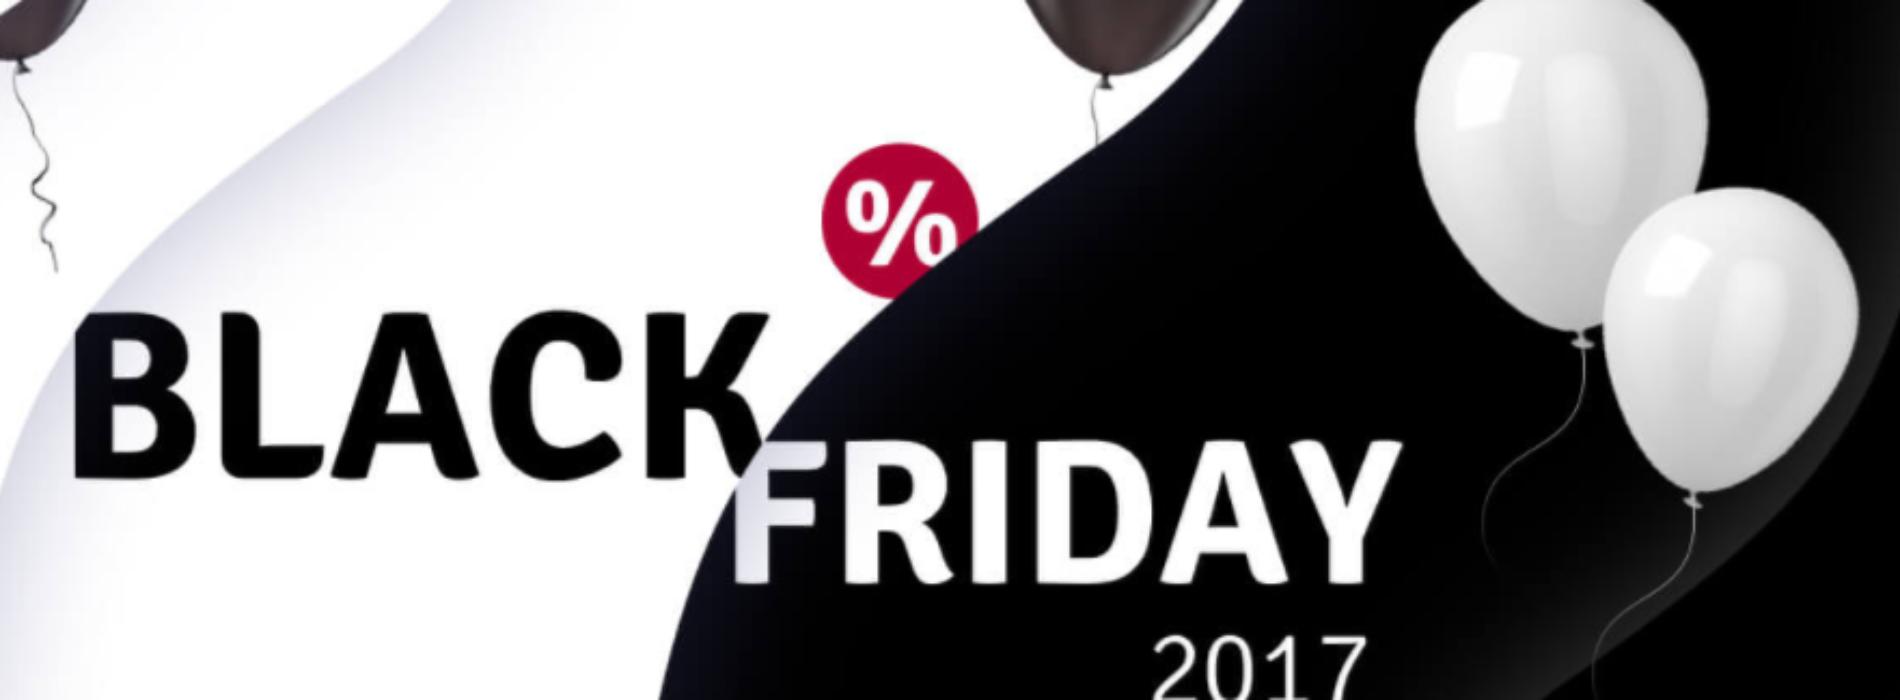 Lista promocji Black Friday 2017 na ShopAlike.pl